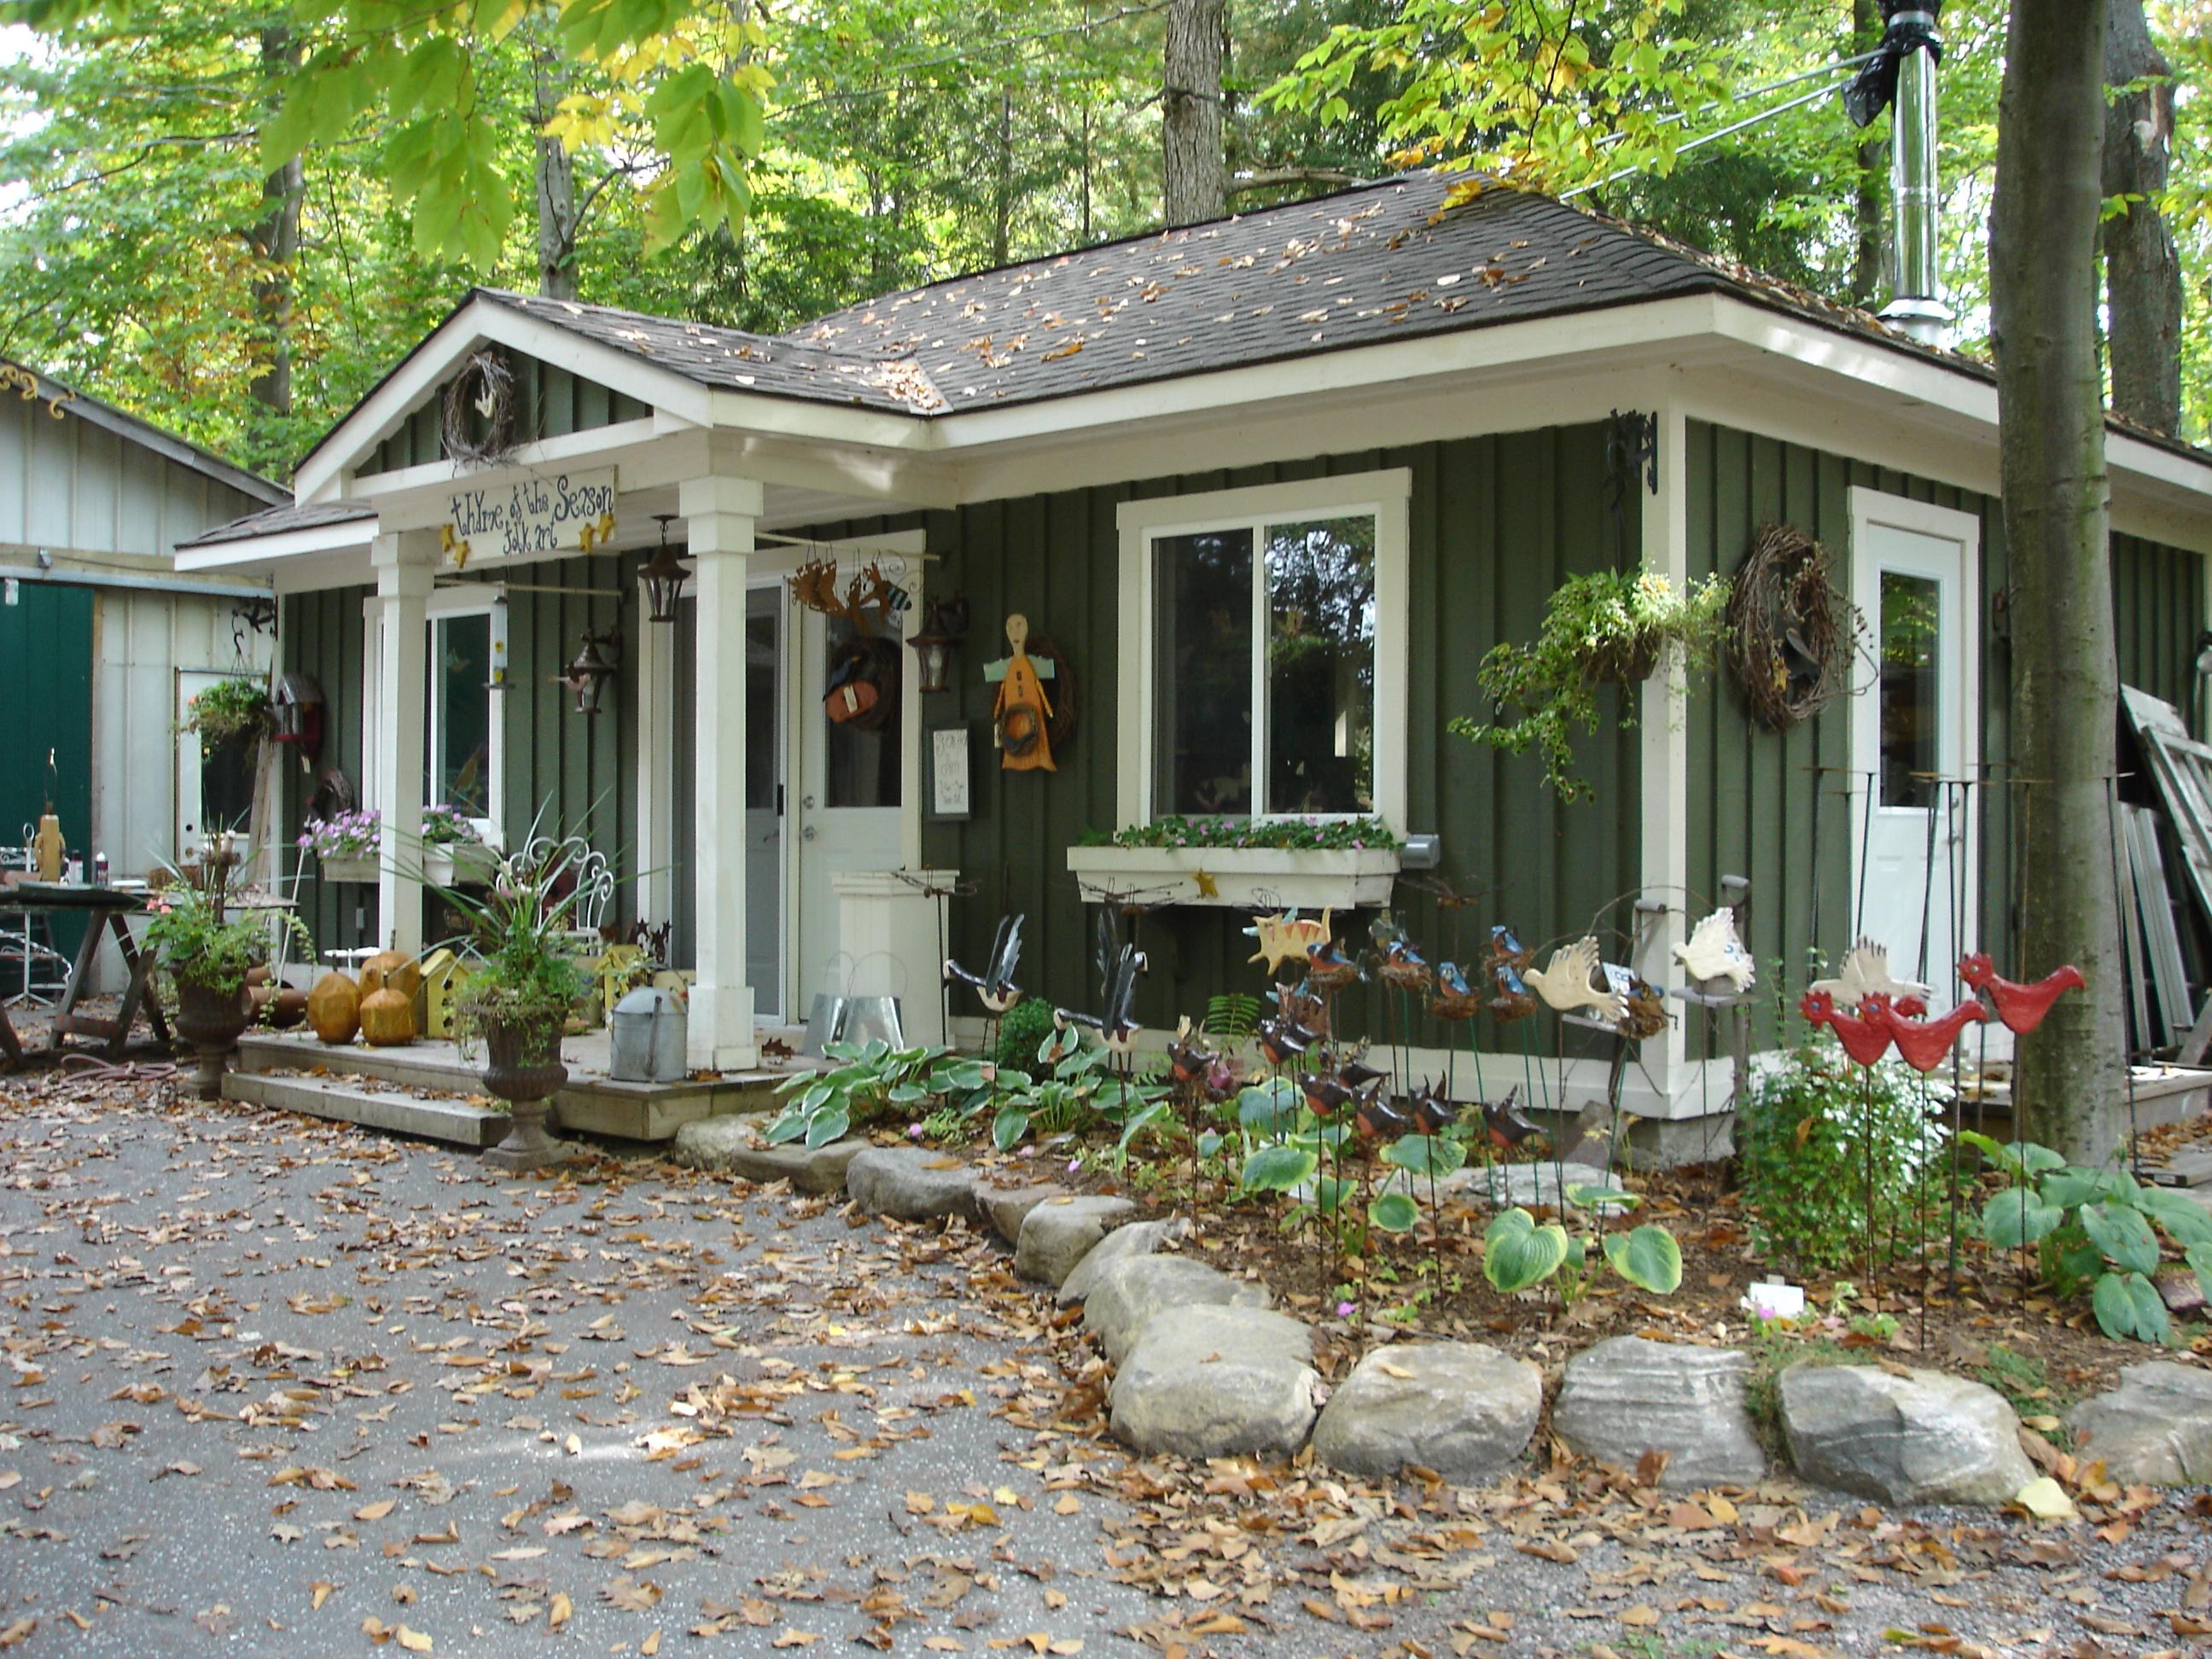 Thyme of the Season - Folk Art Studio & Store